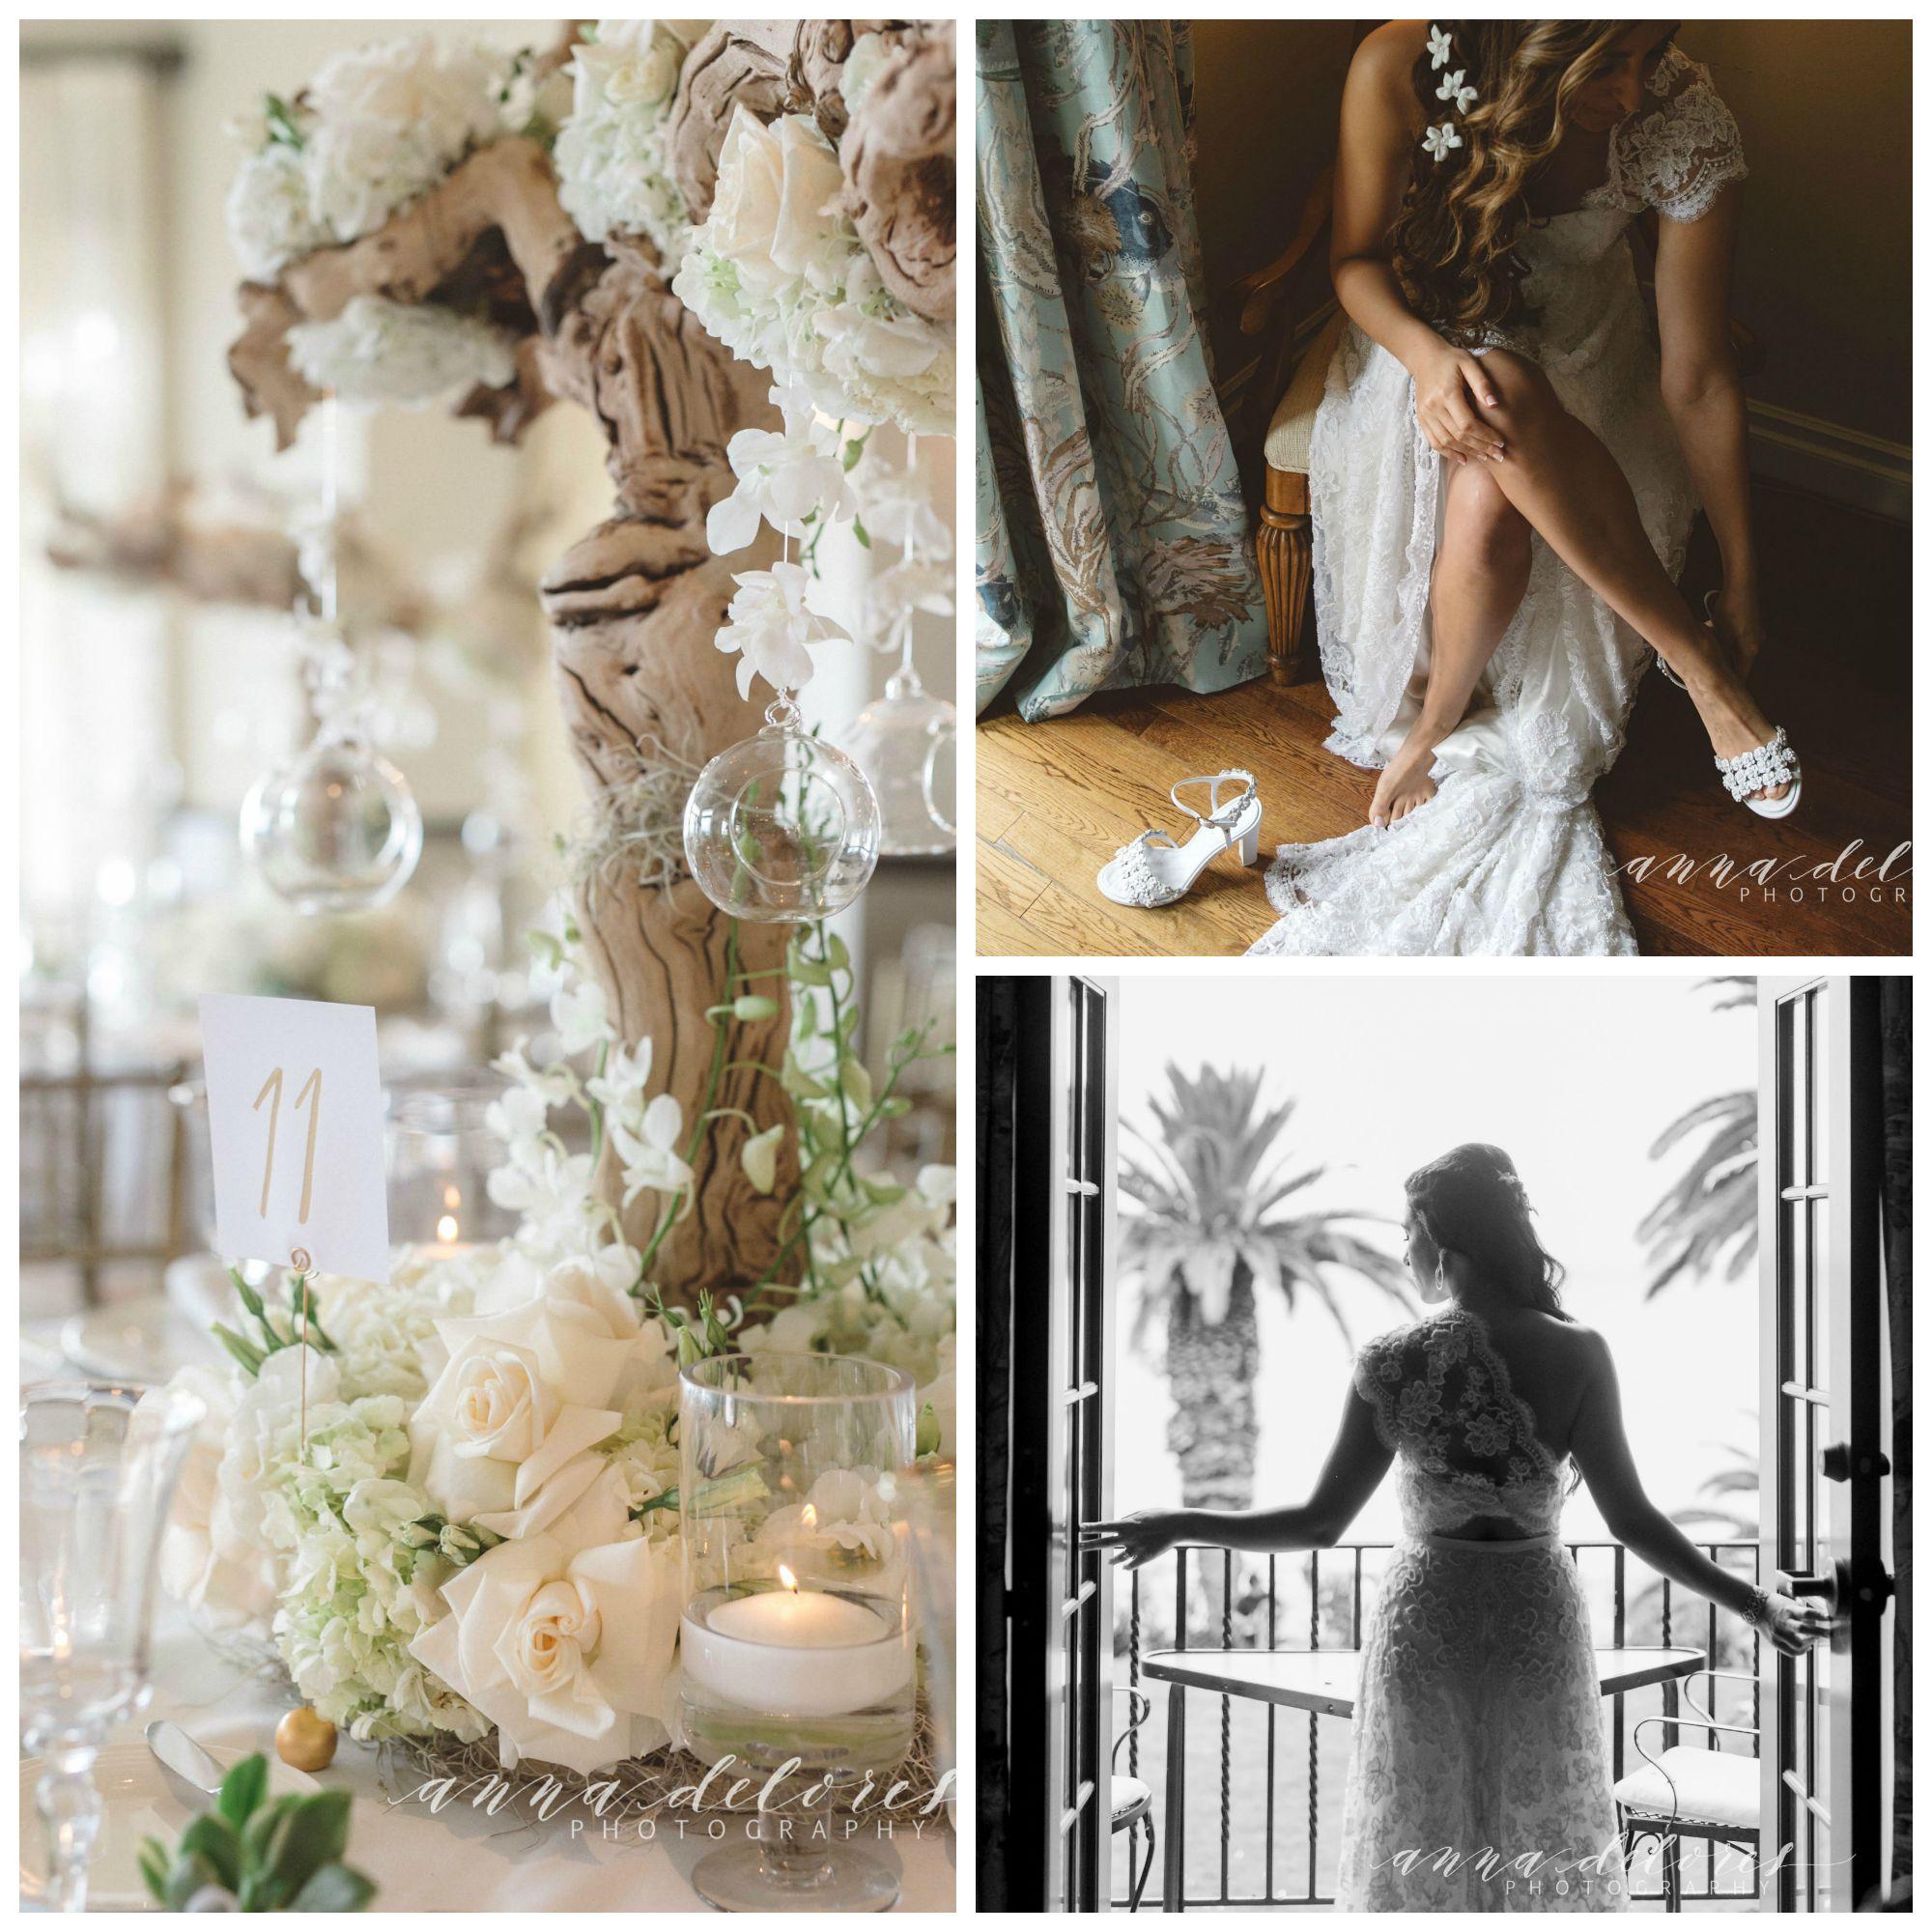 Ellana & Jeffrey - Collage 1